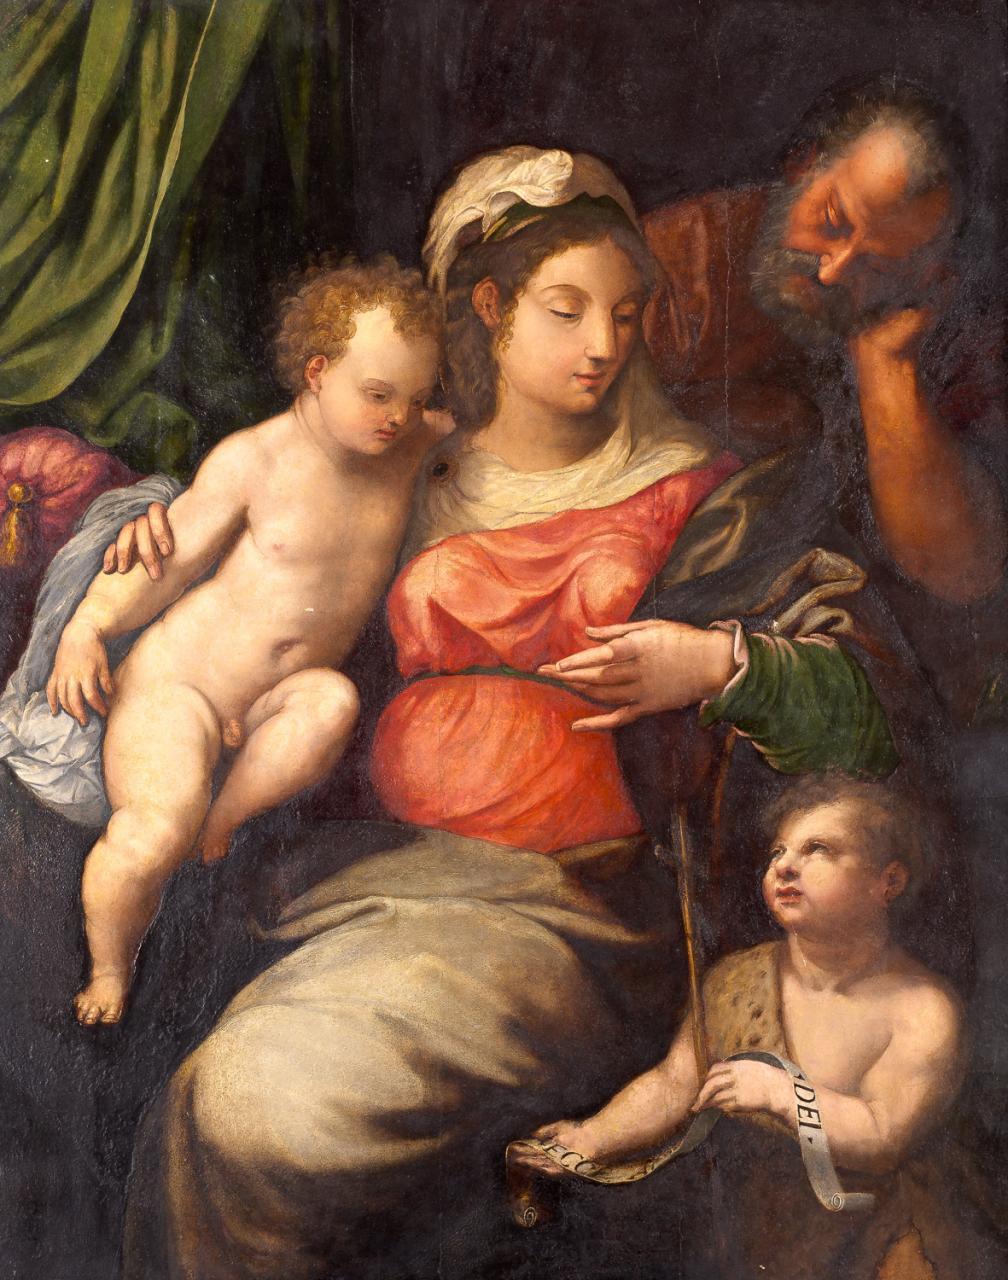 Francesco-Morandini-Sagrada-Familia-con-San-Juanito